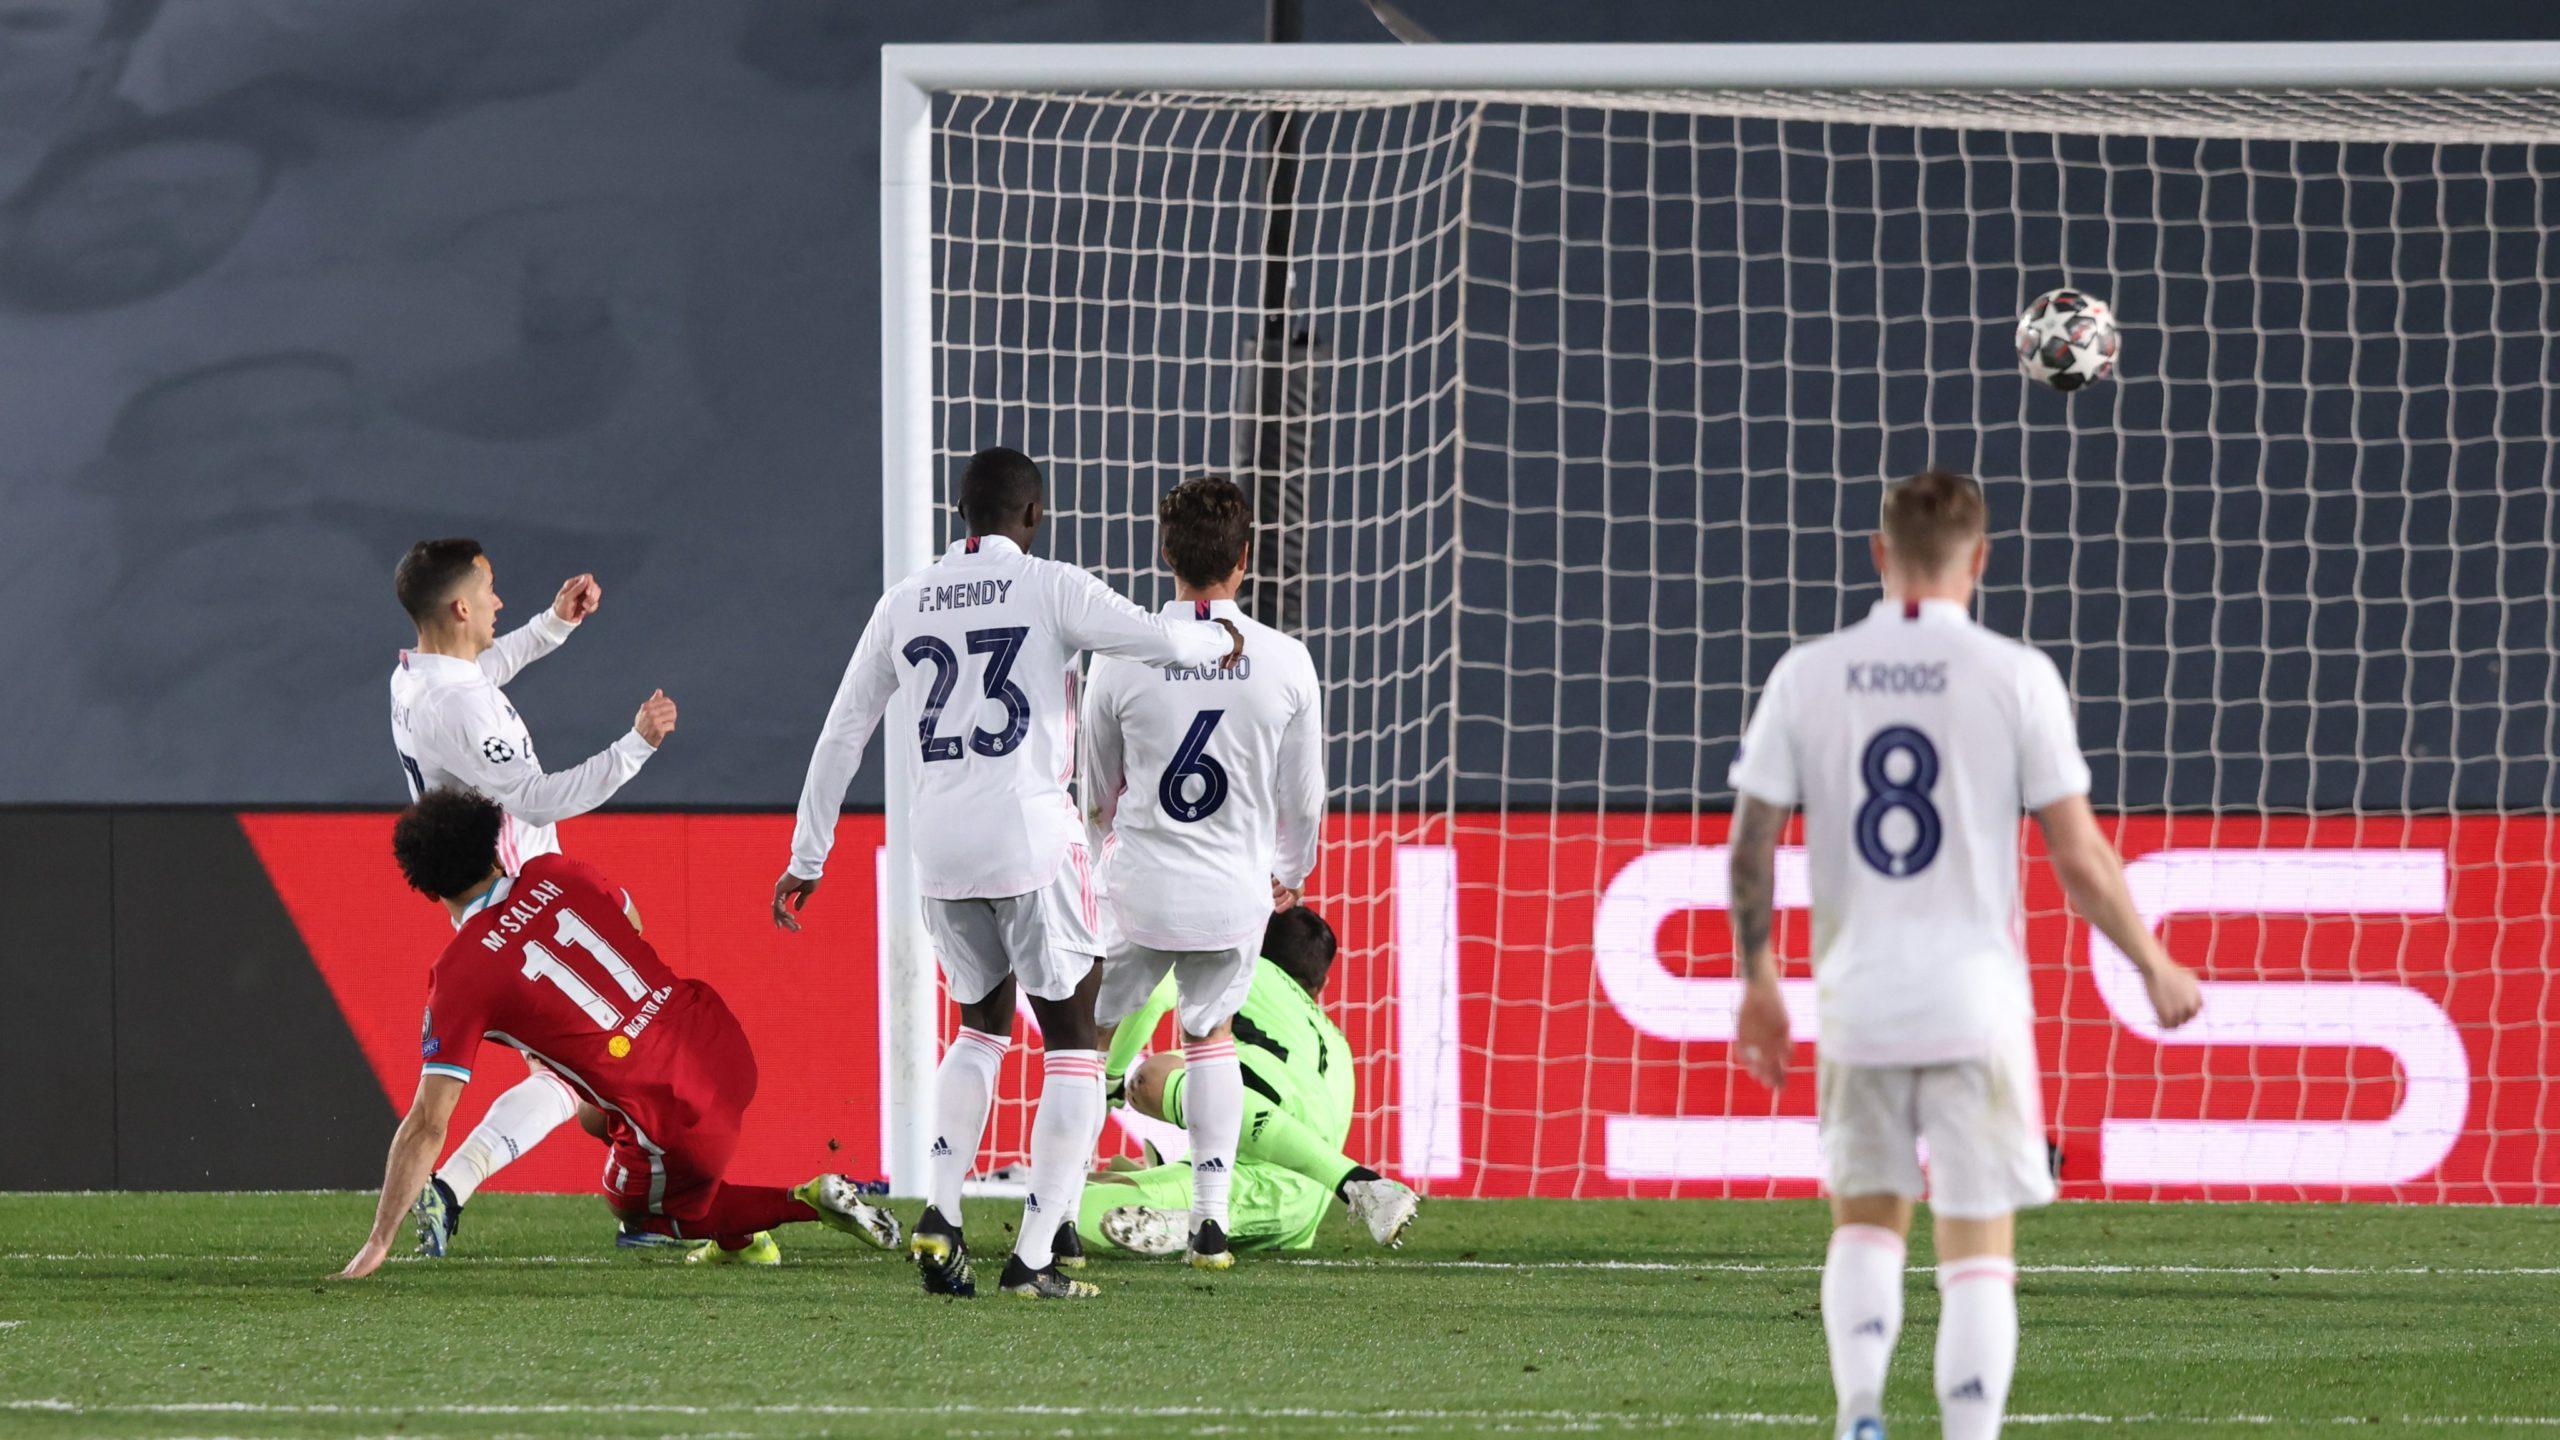 Mohammed Salah scores [PHOTO CREDIT: @LFC]